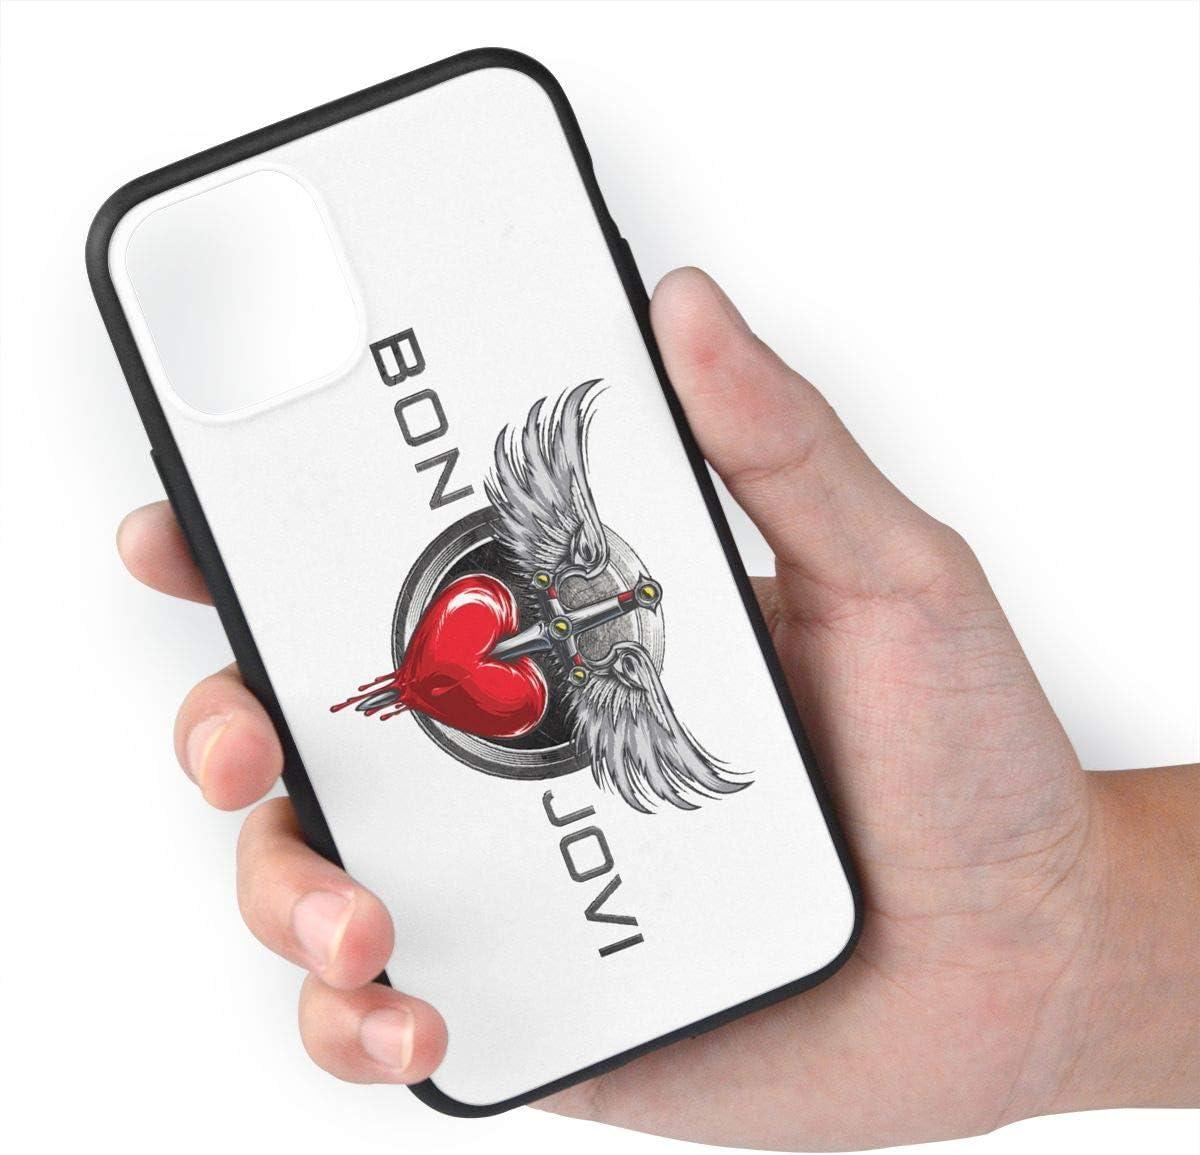 MaMing Bon Jovi Design Fashion iPhone 11 case TPU 11 pro max Cases Gift iPhone 11